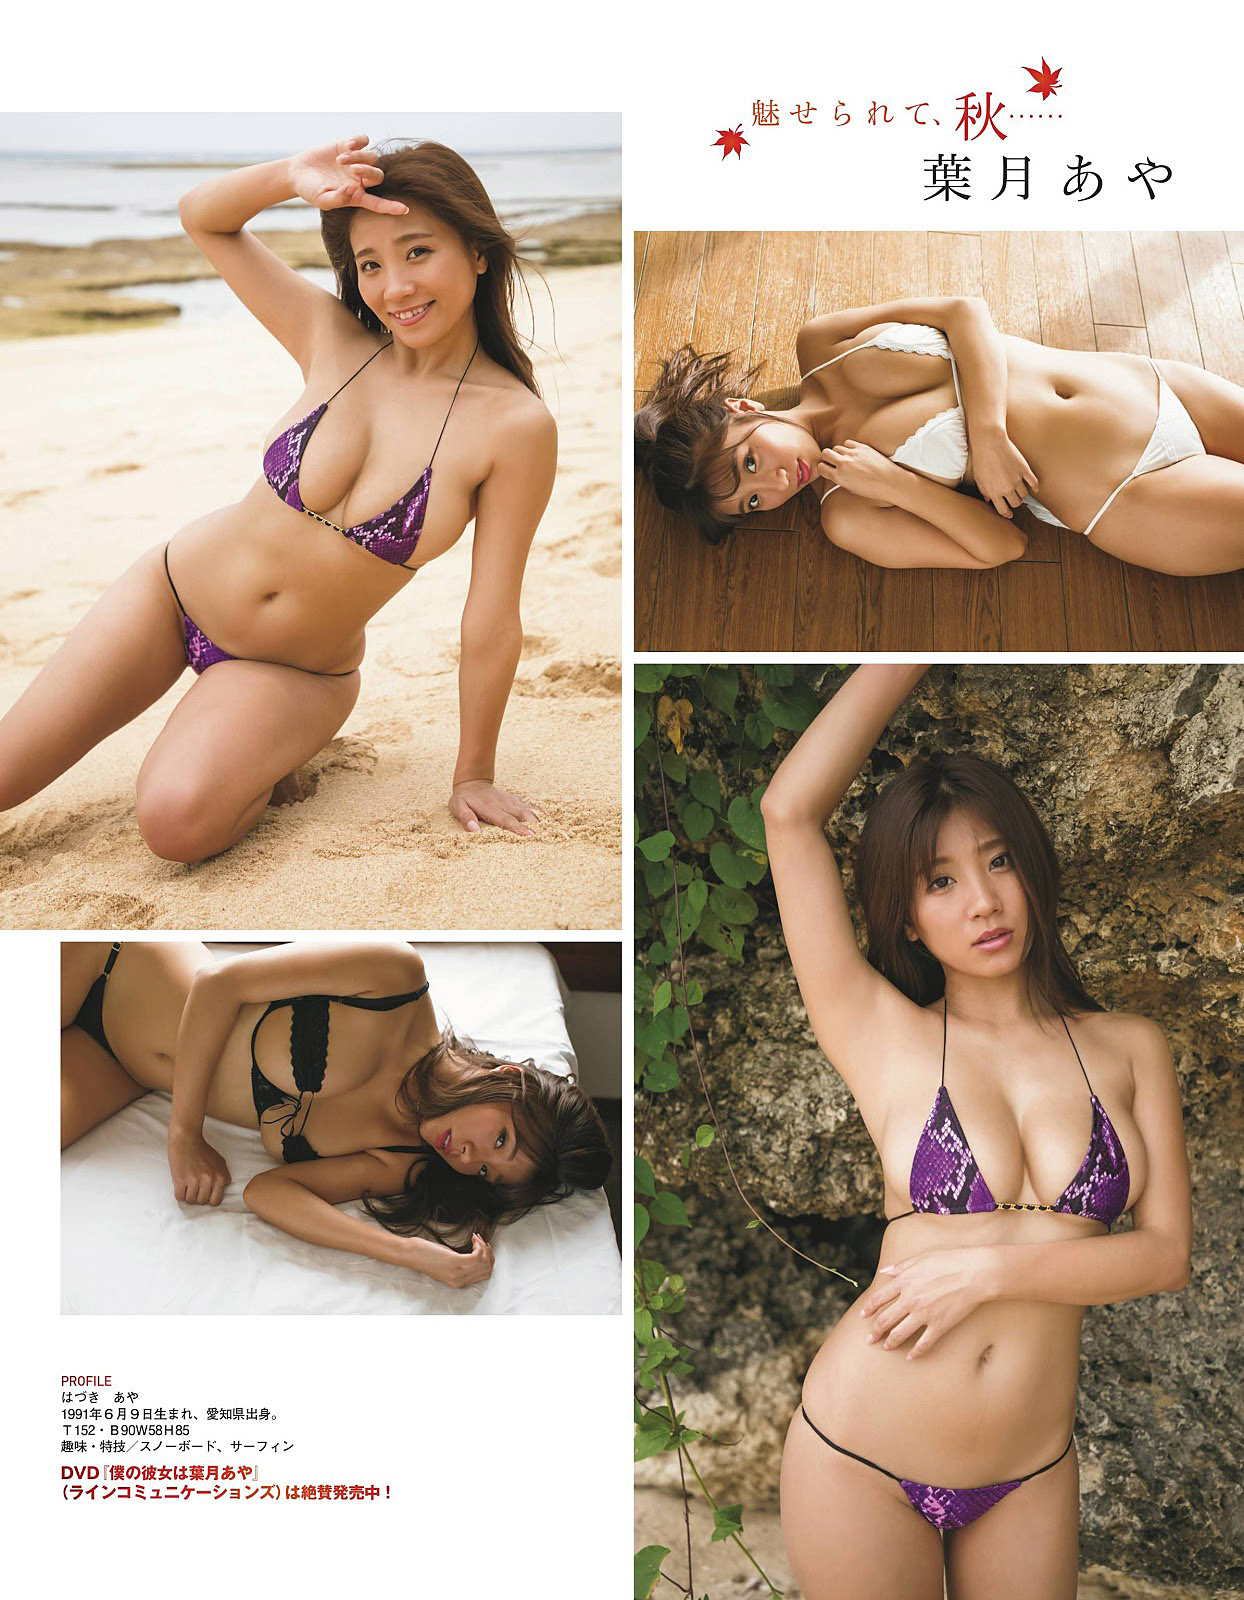 Aya Hazuki Ex-Taishu 1911 03.jpg